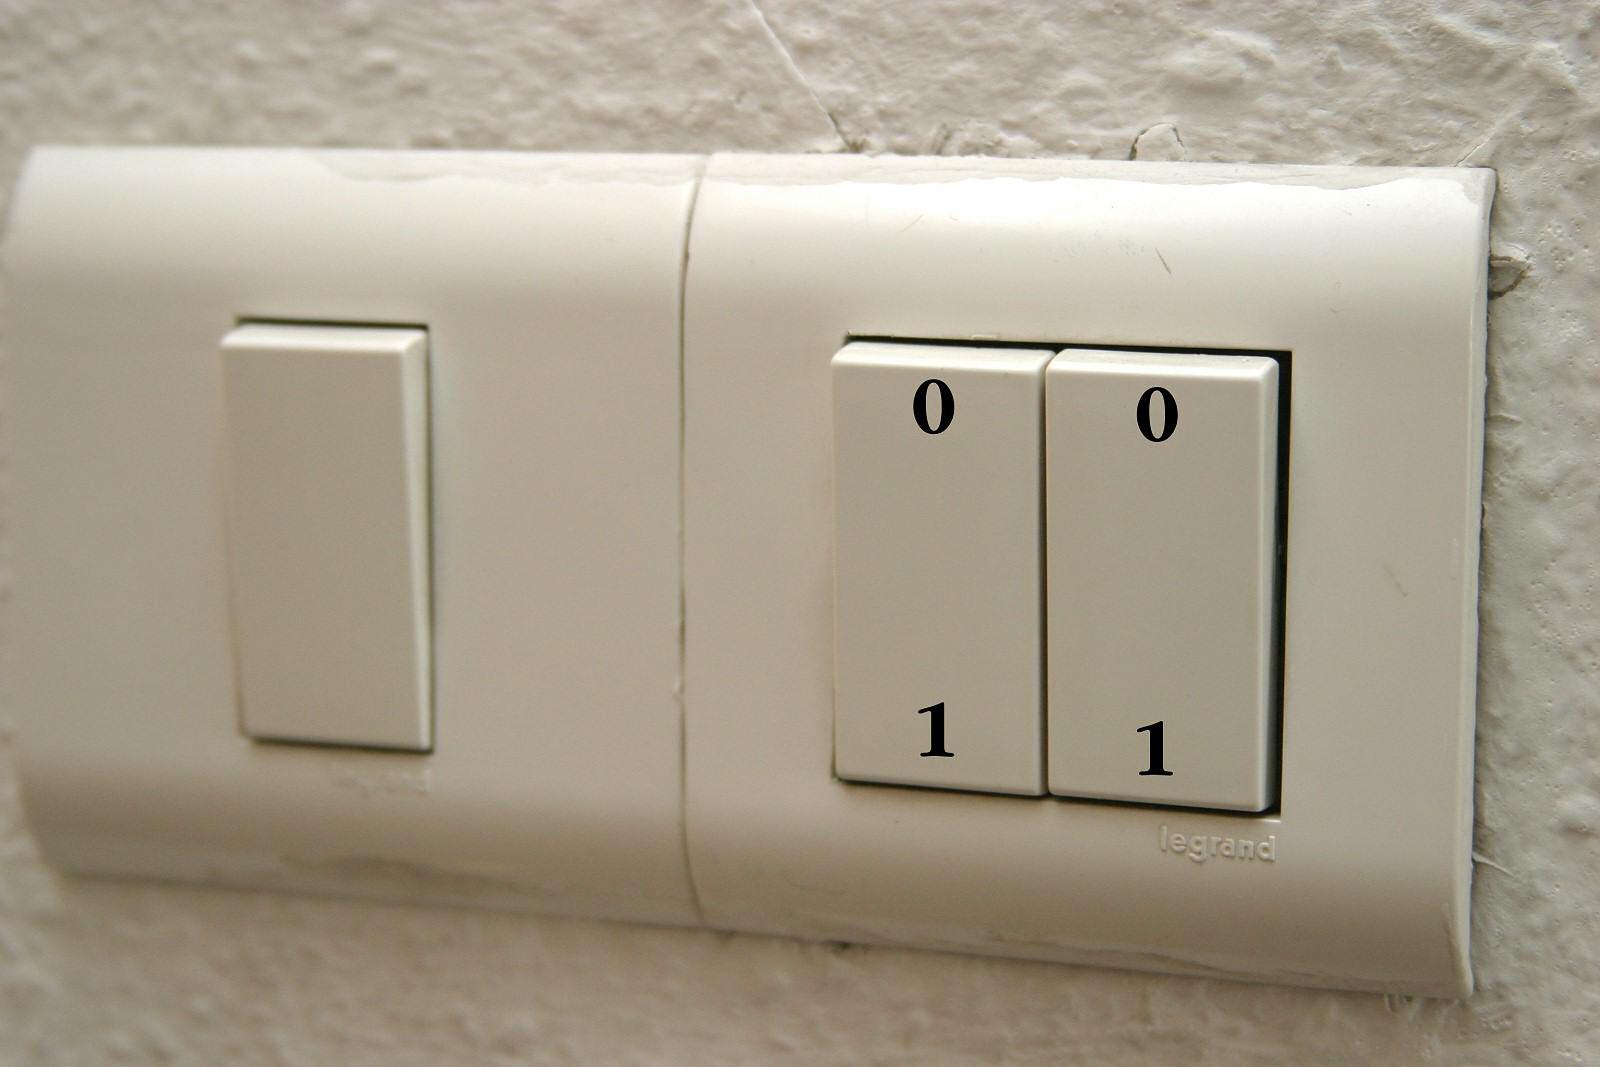 jelek bináris opciók snals)